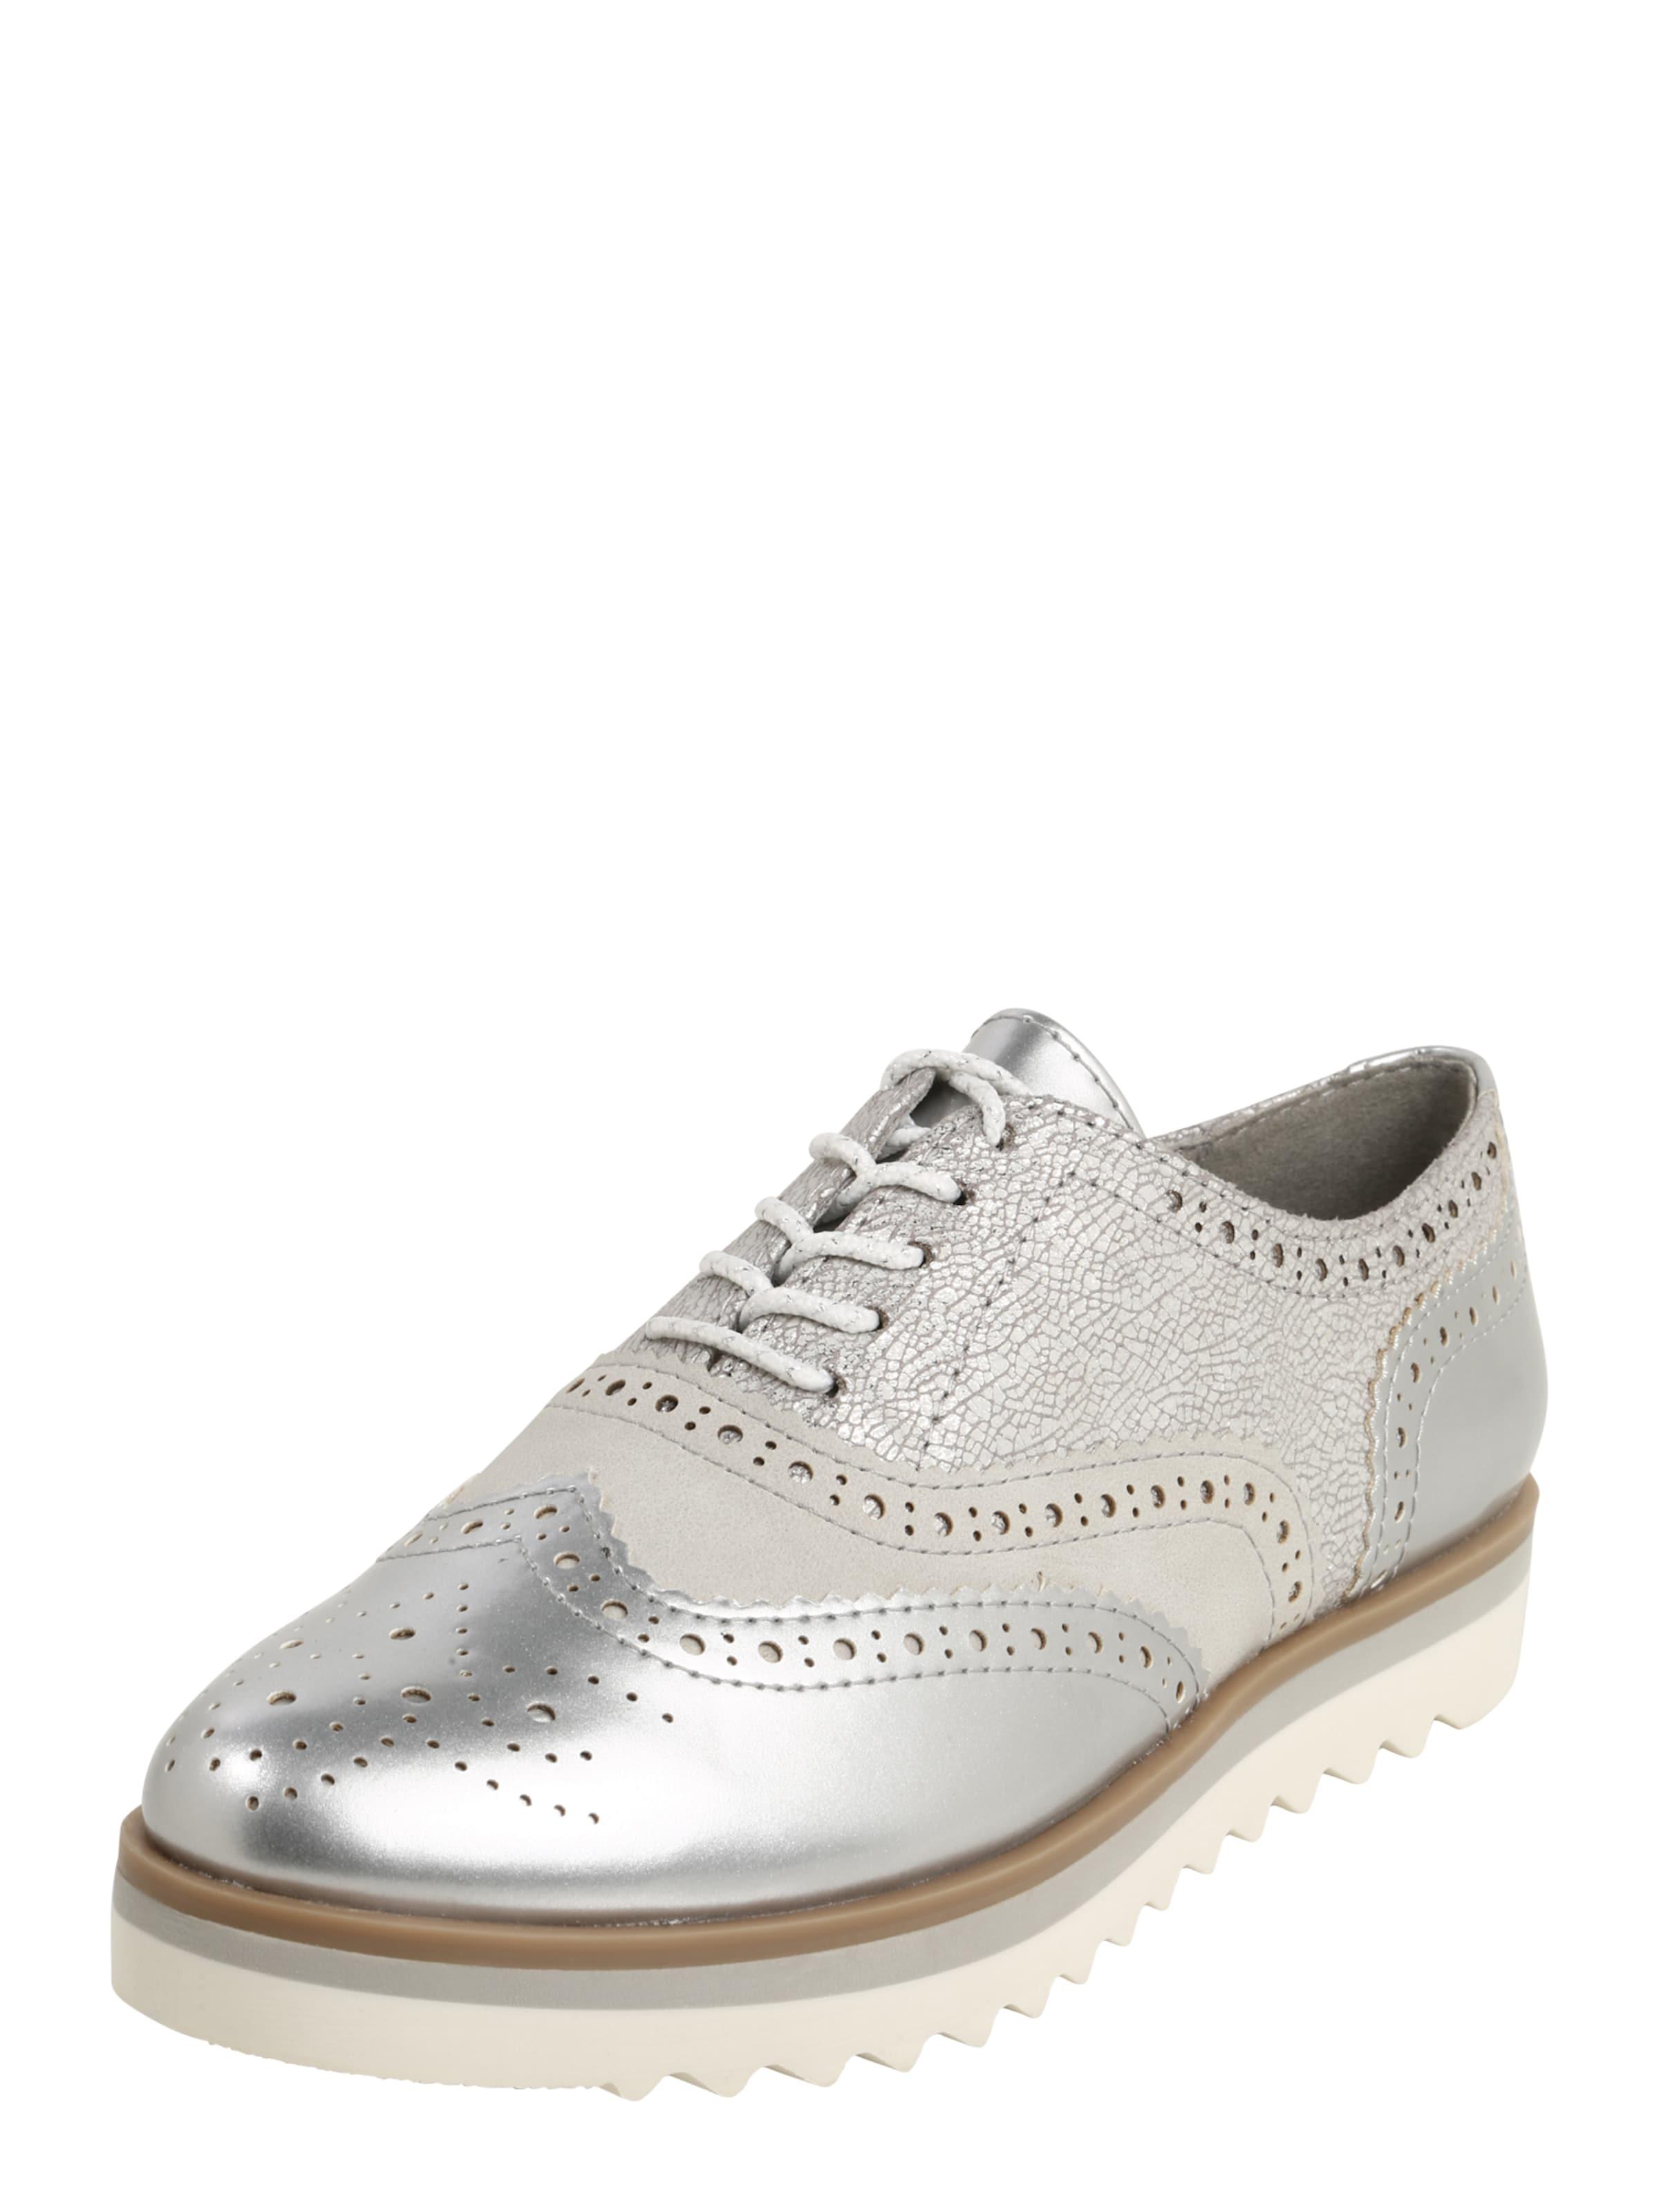 MARCO MARCO MARCO TOZZI   Brogue mit sportlicher Laufsohle Schuhe Gut getragene Schuhe d6aa61